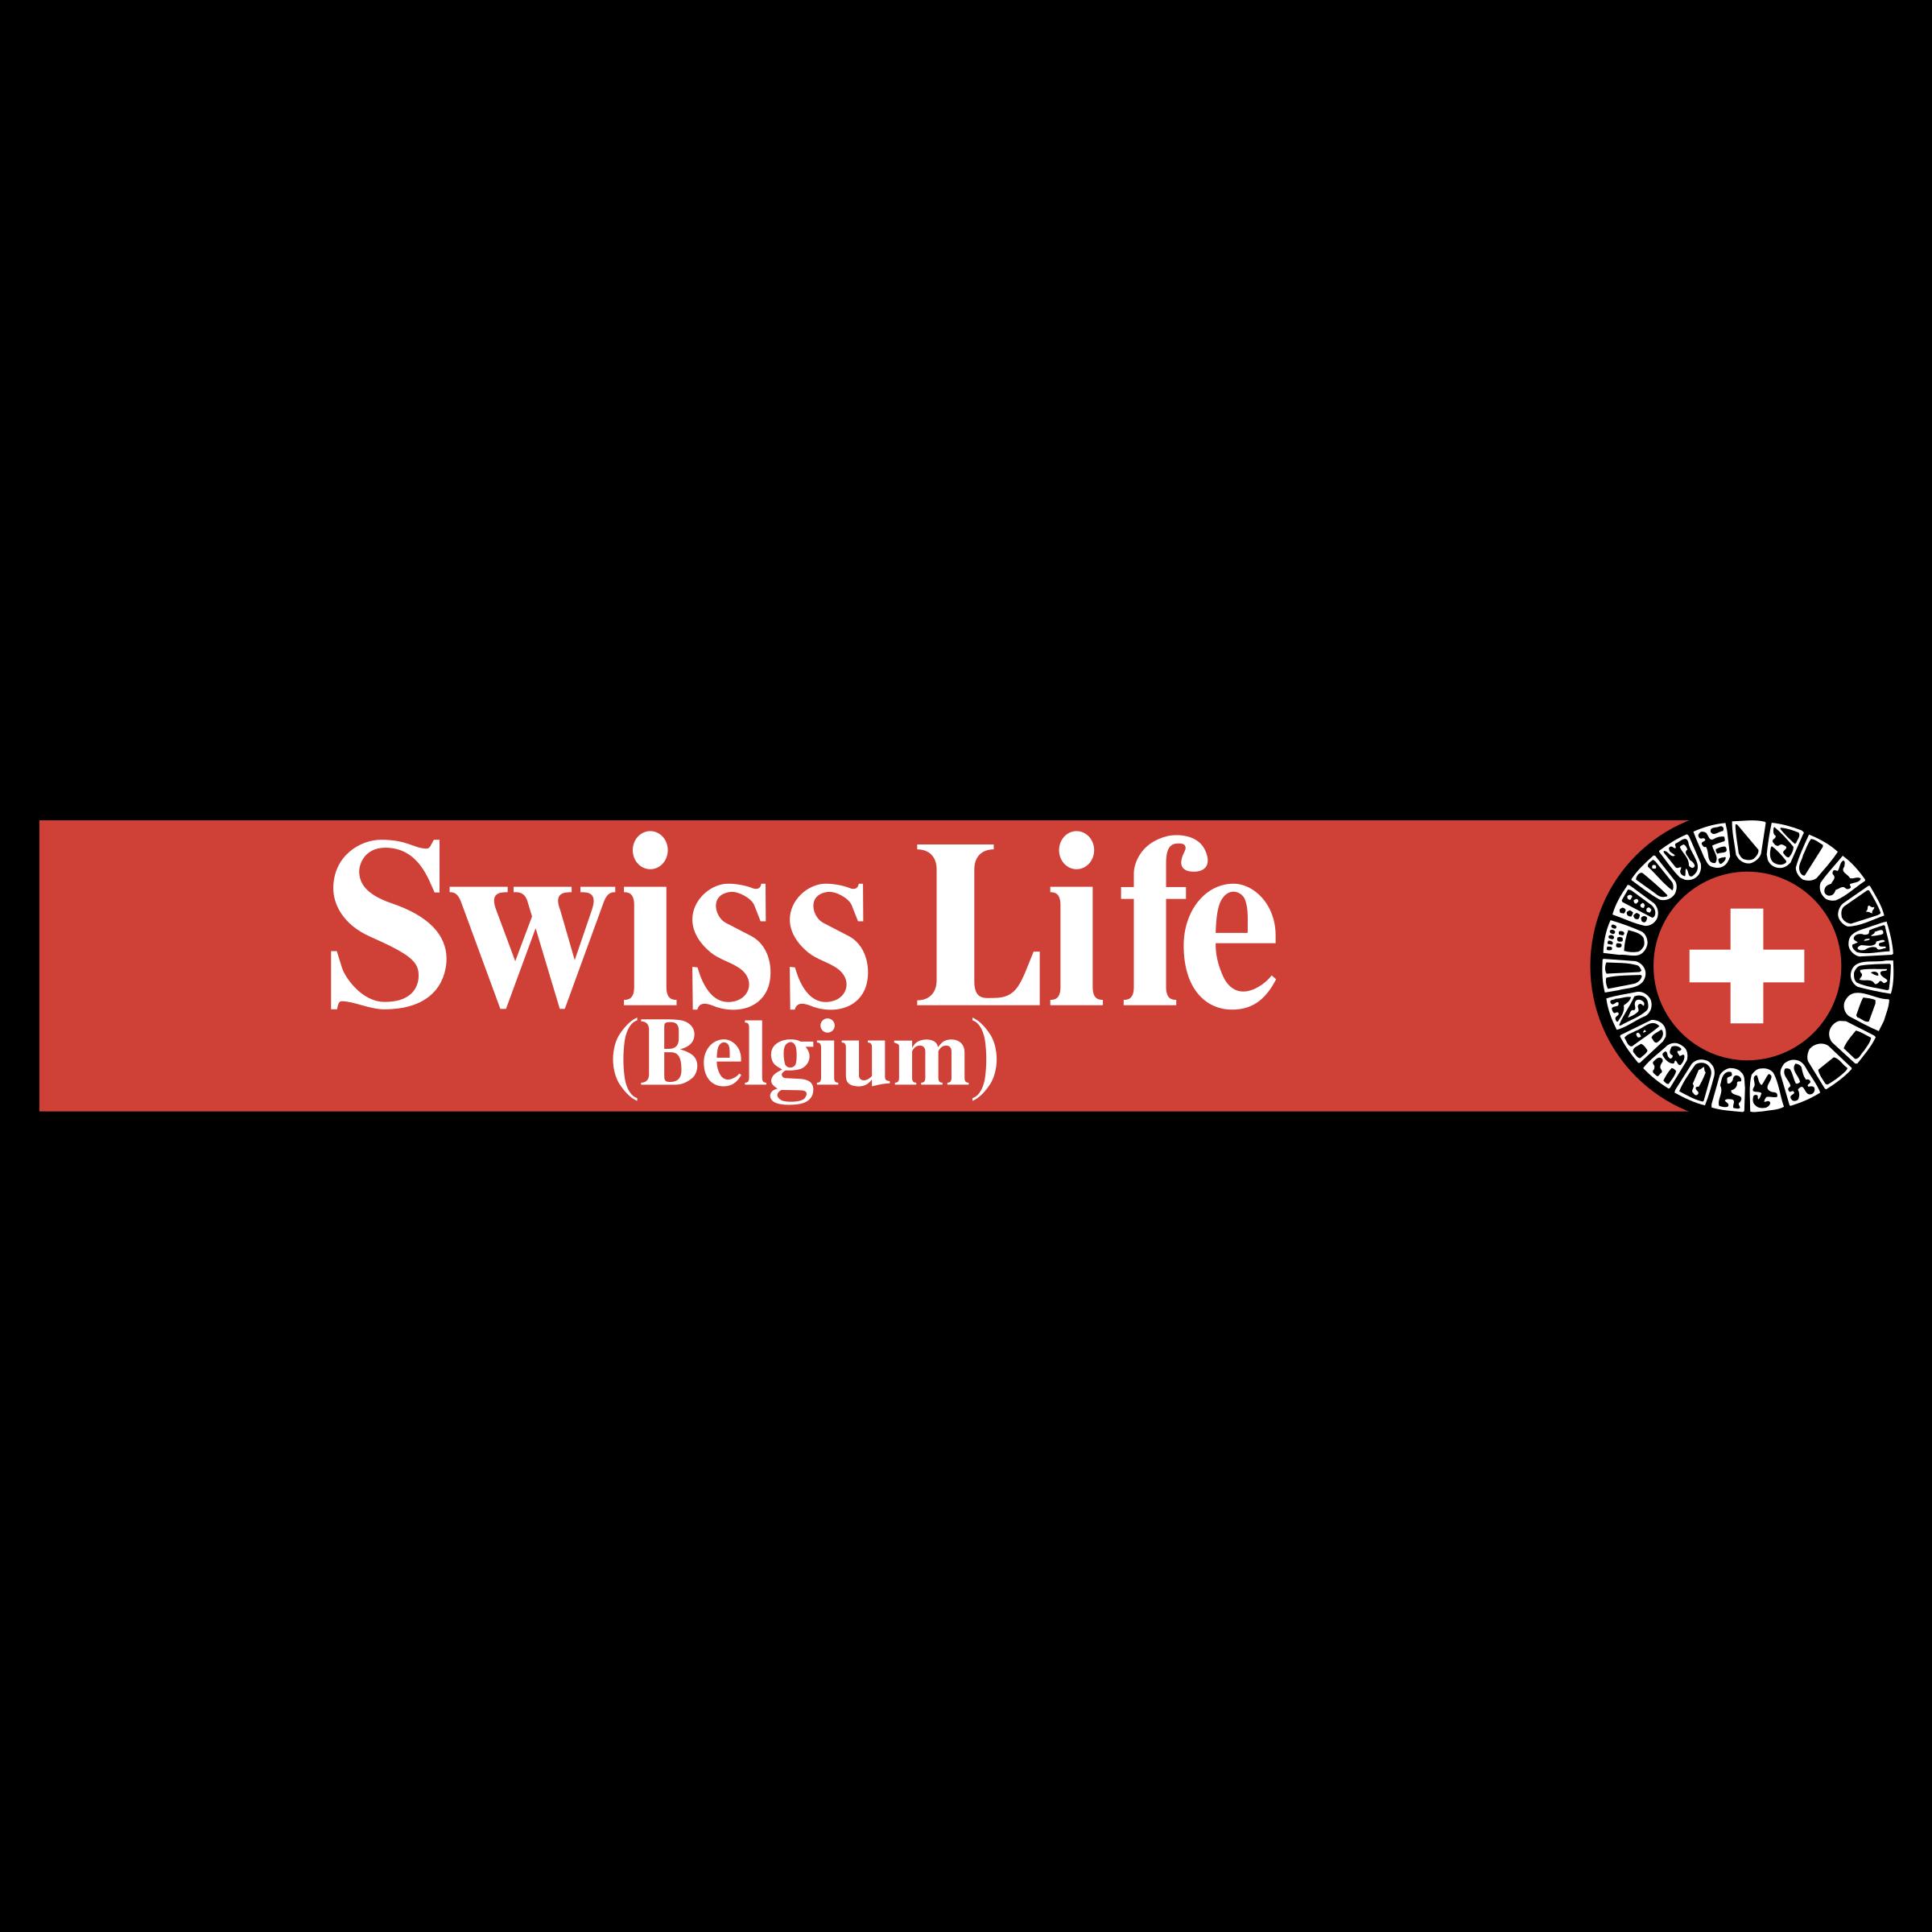 Swiss Life Logo PNG Transparent & SVG Vector.